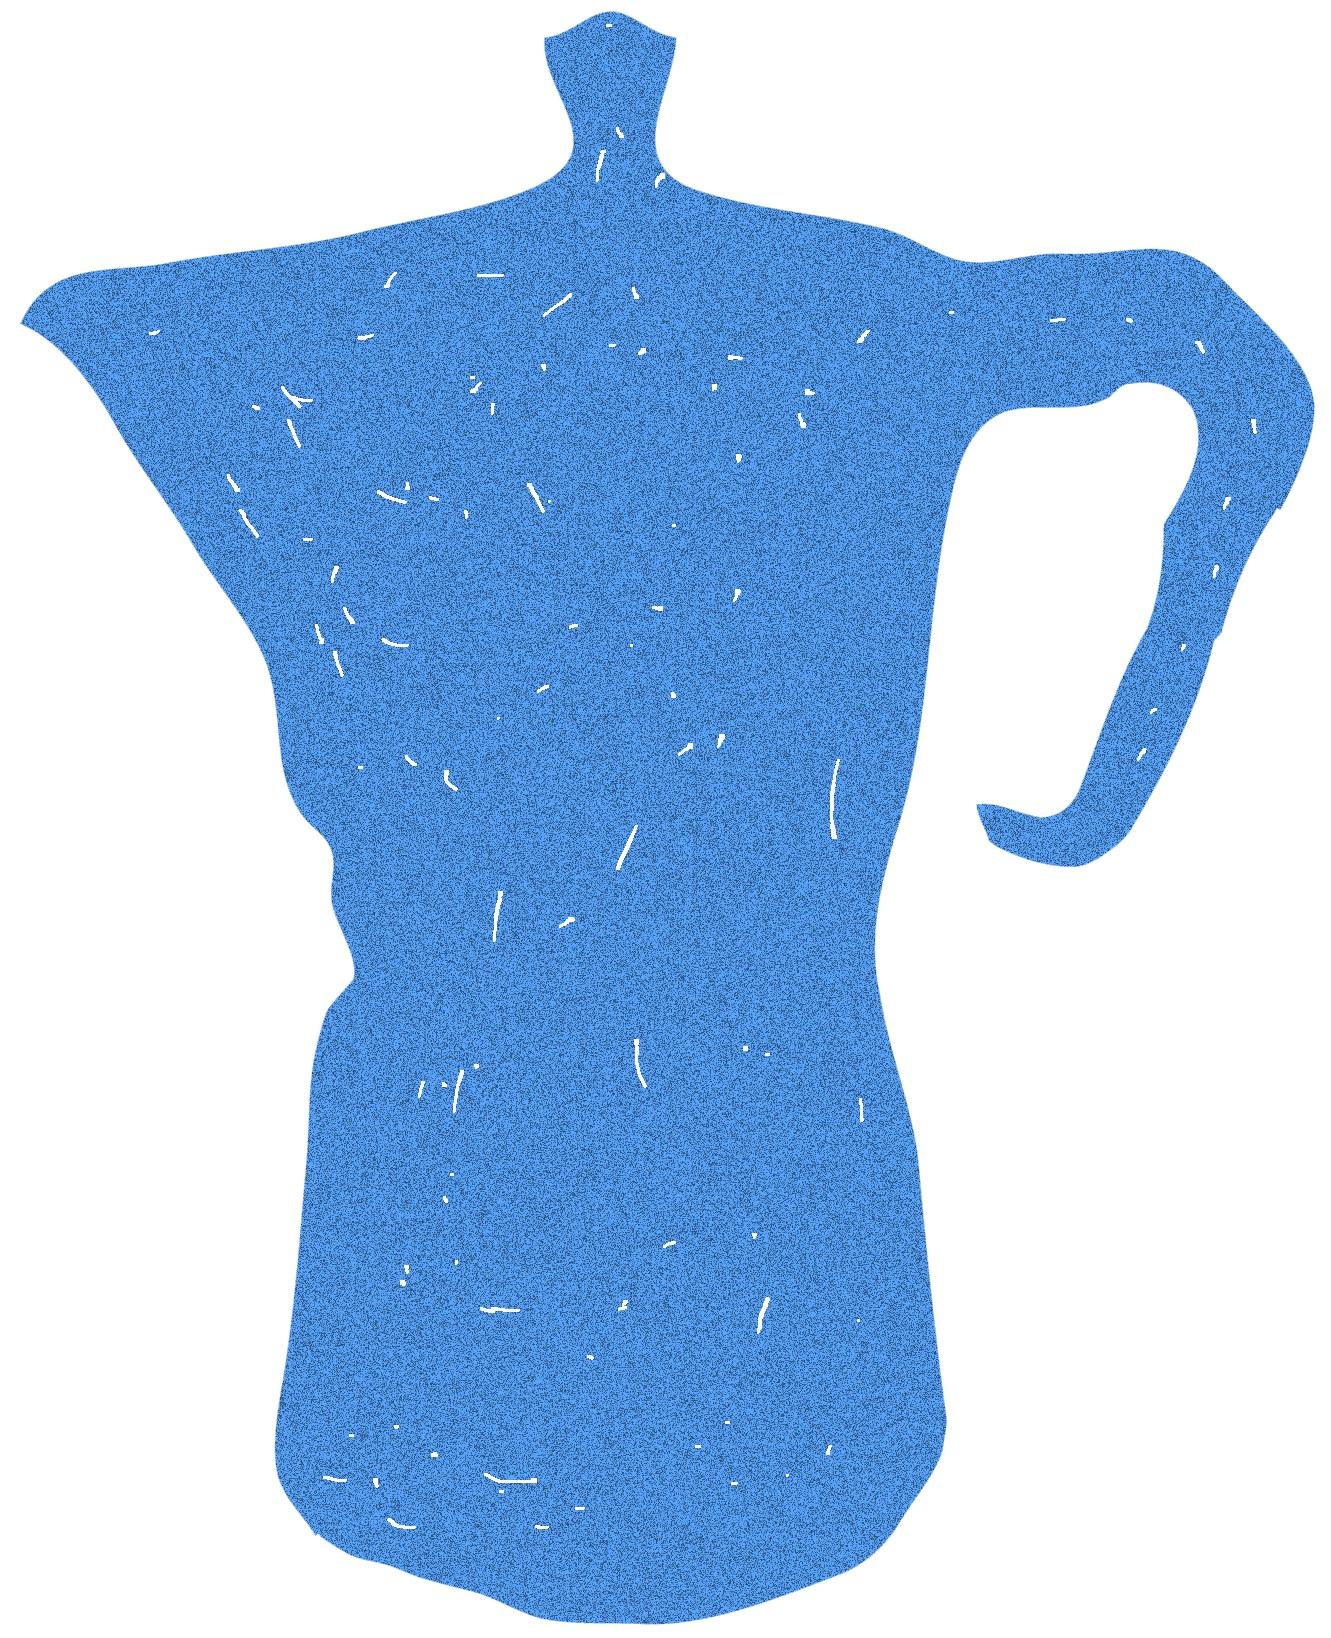 coffeepot copy.jpg